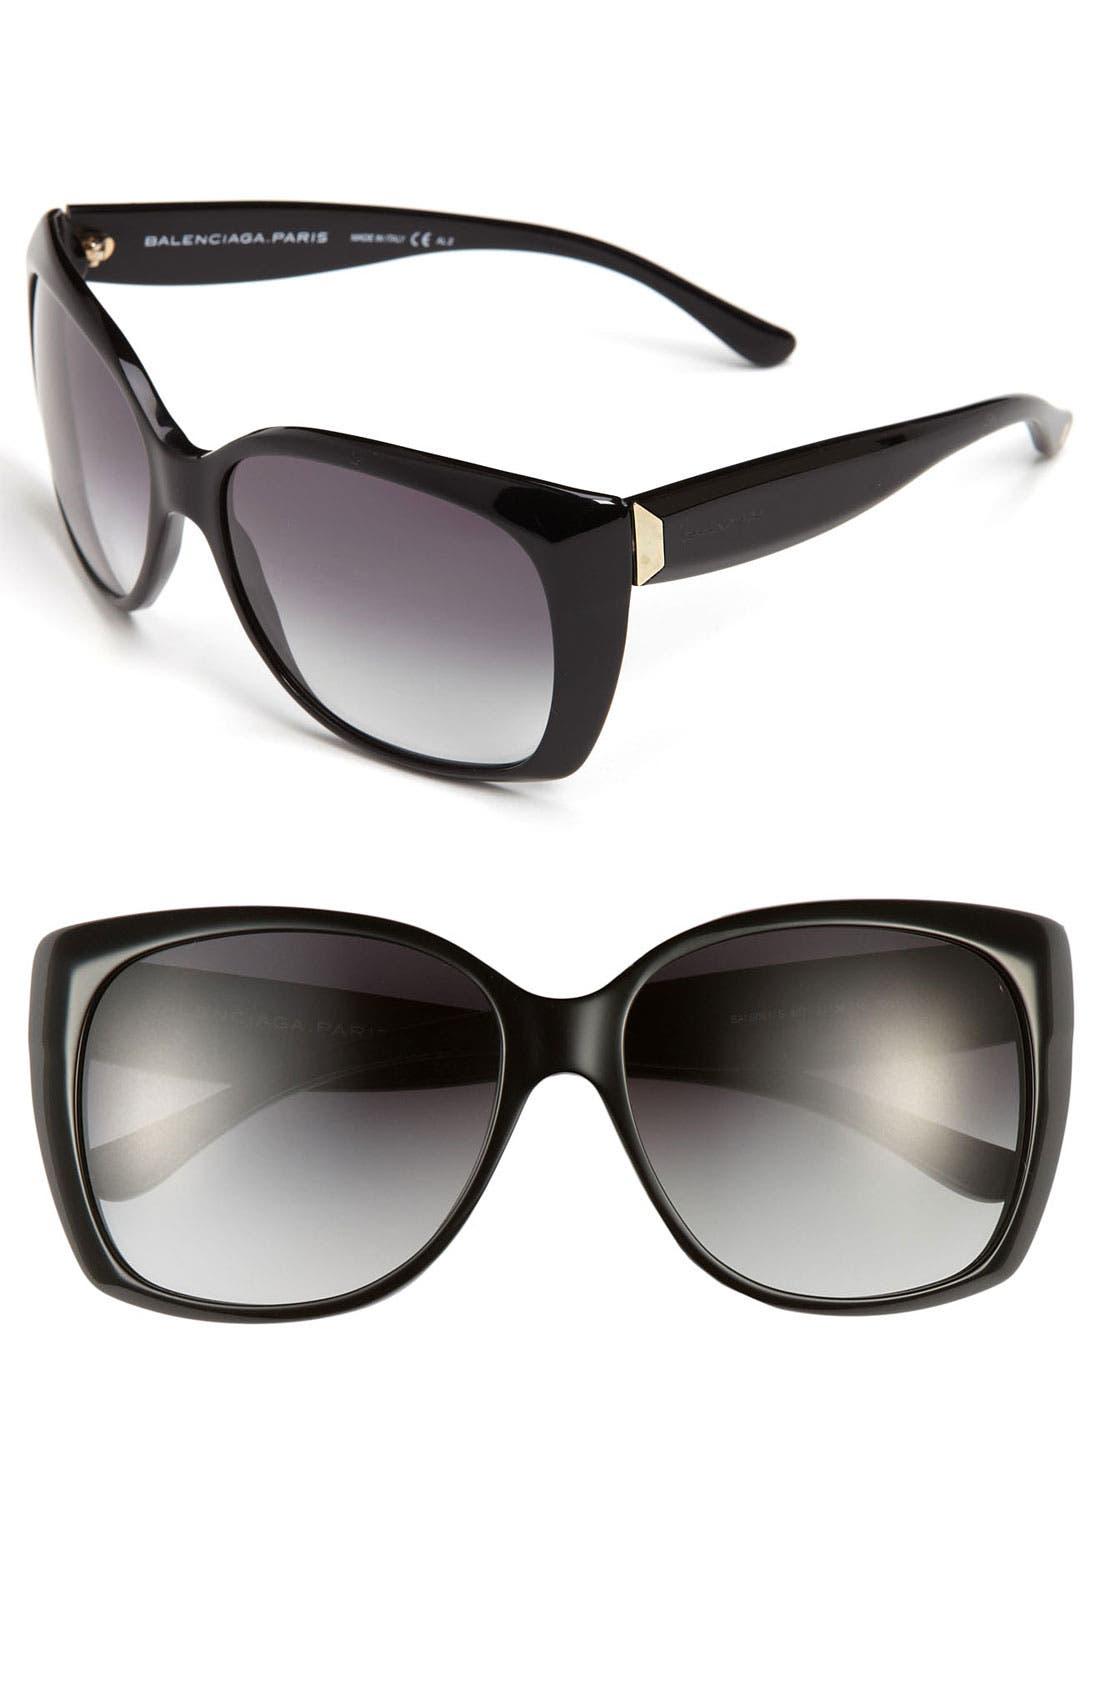 Alternate Image 1 Selected - Balenciaga Paris Cat's Eye Sunglasses